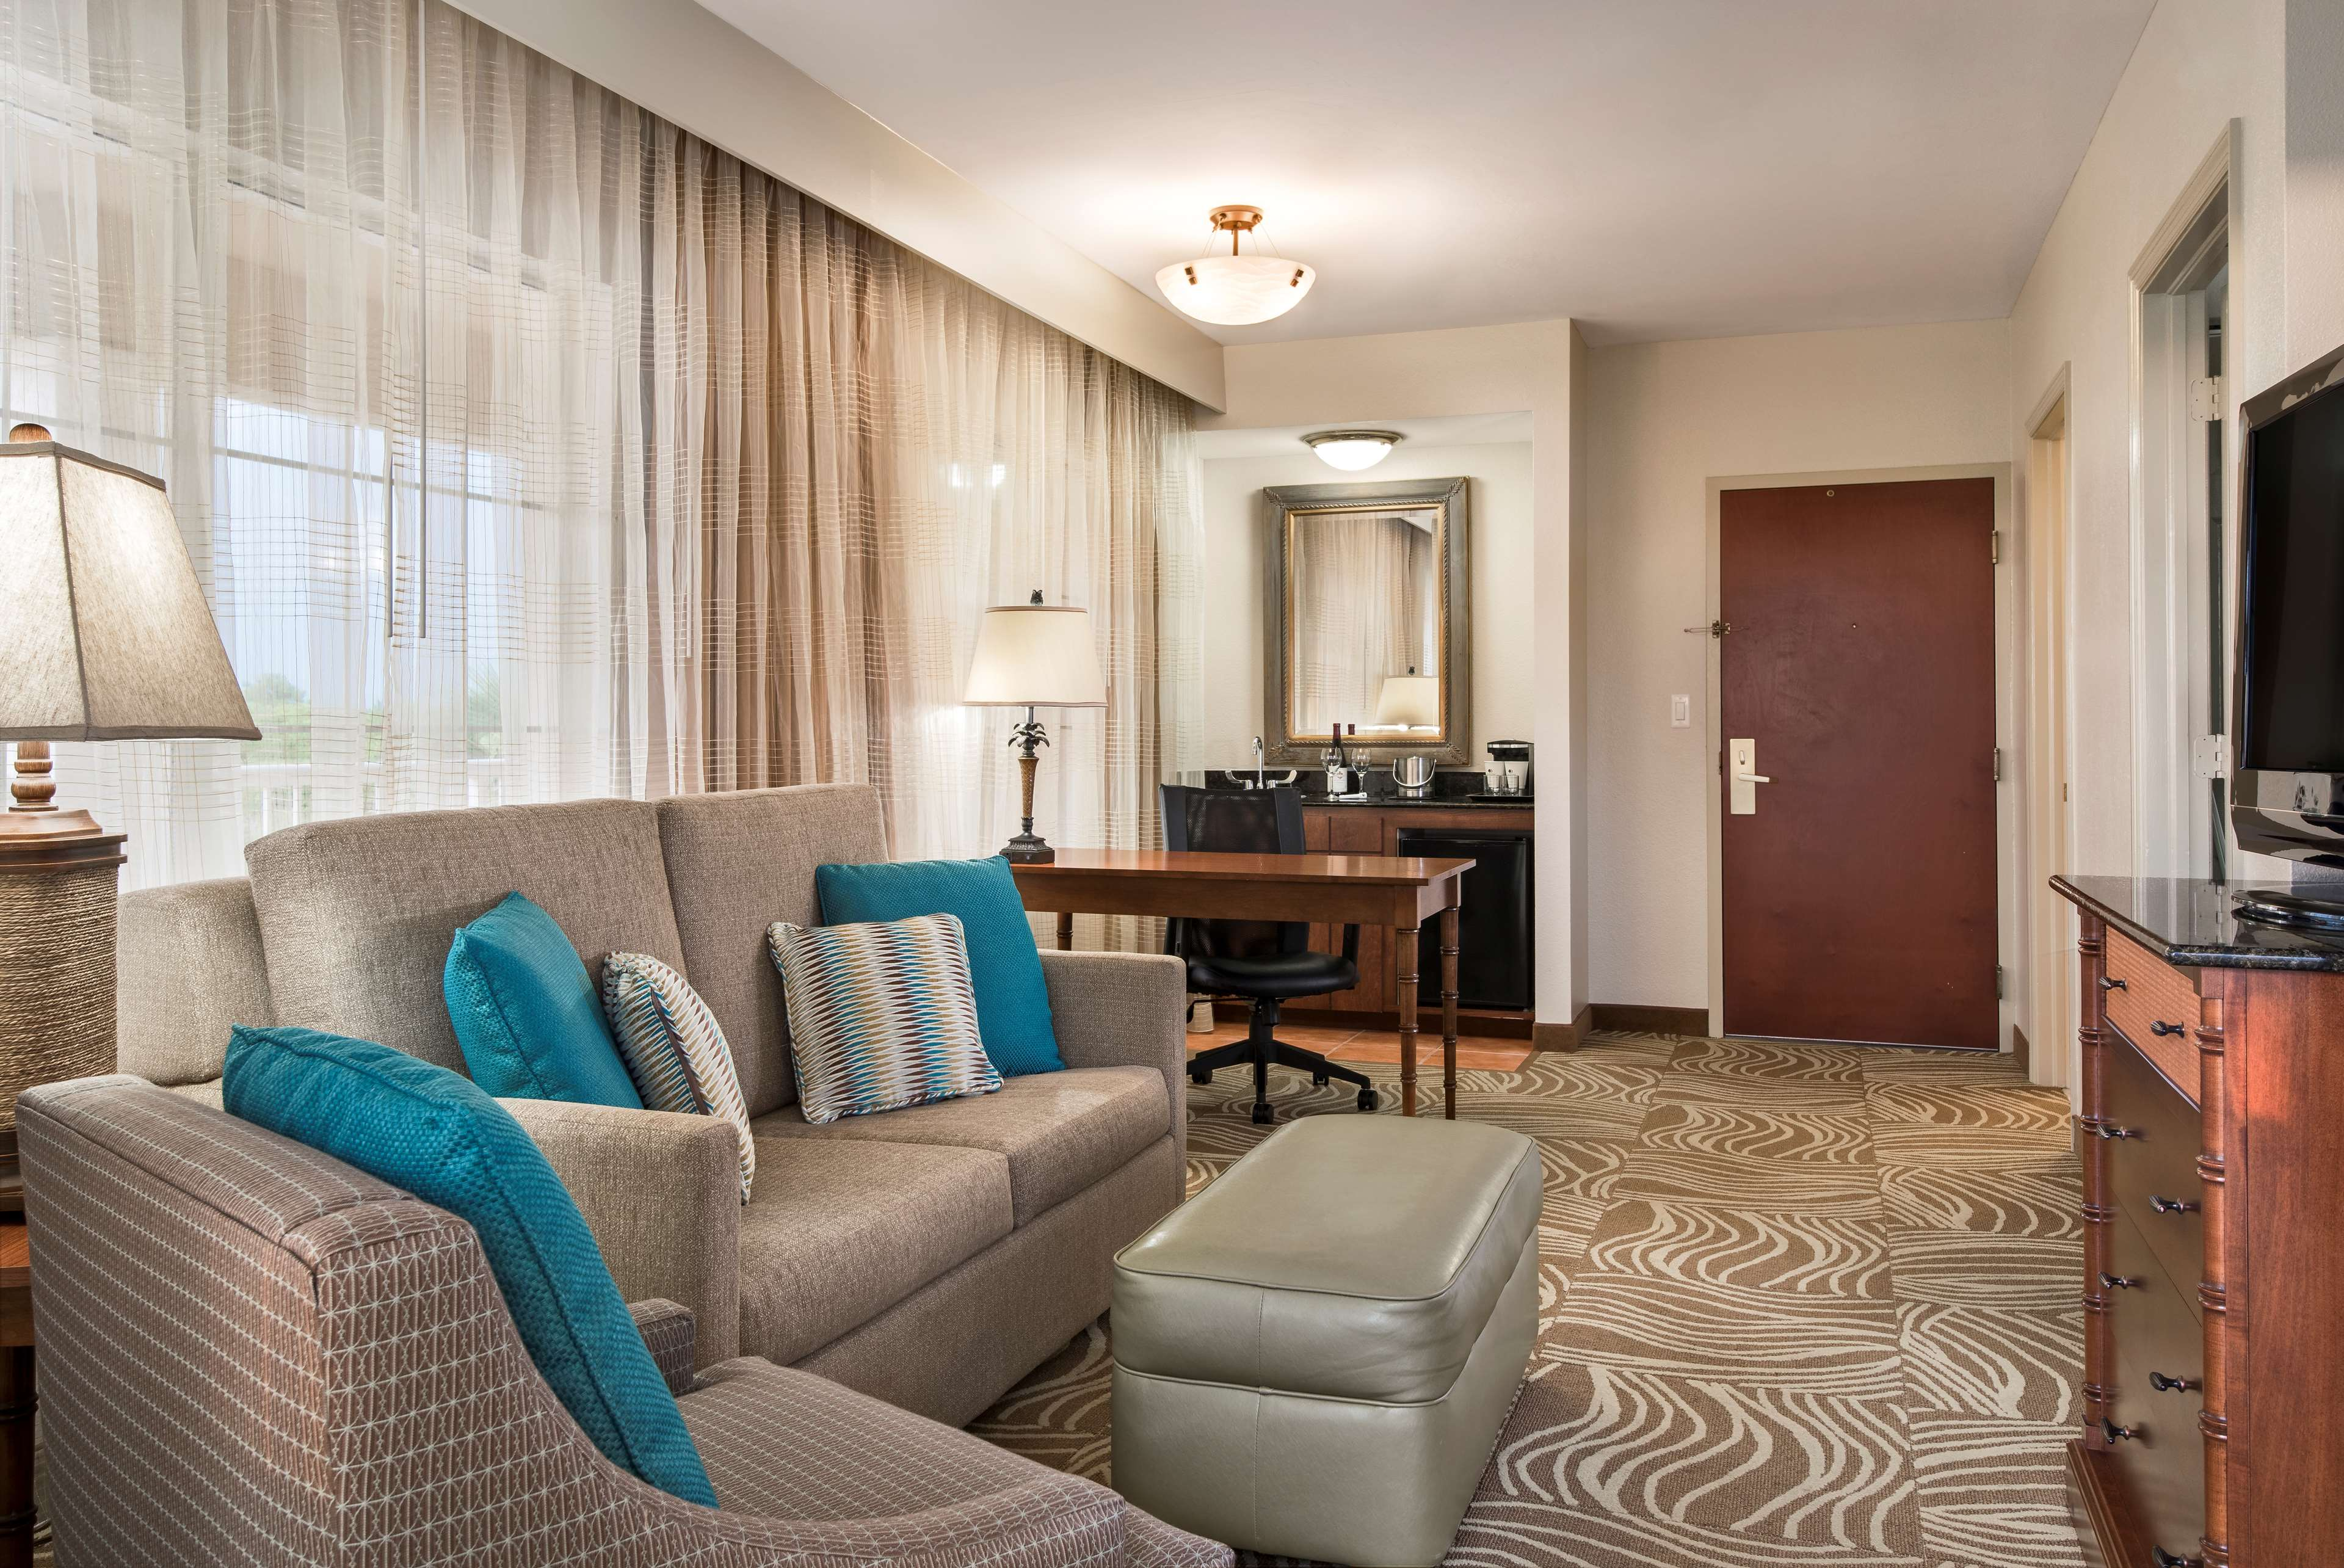 DoubleTree Suites by Hilton Hotel Naples image 16